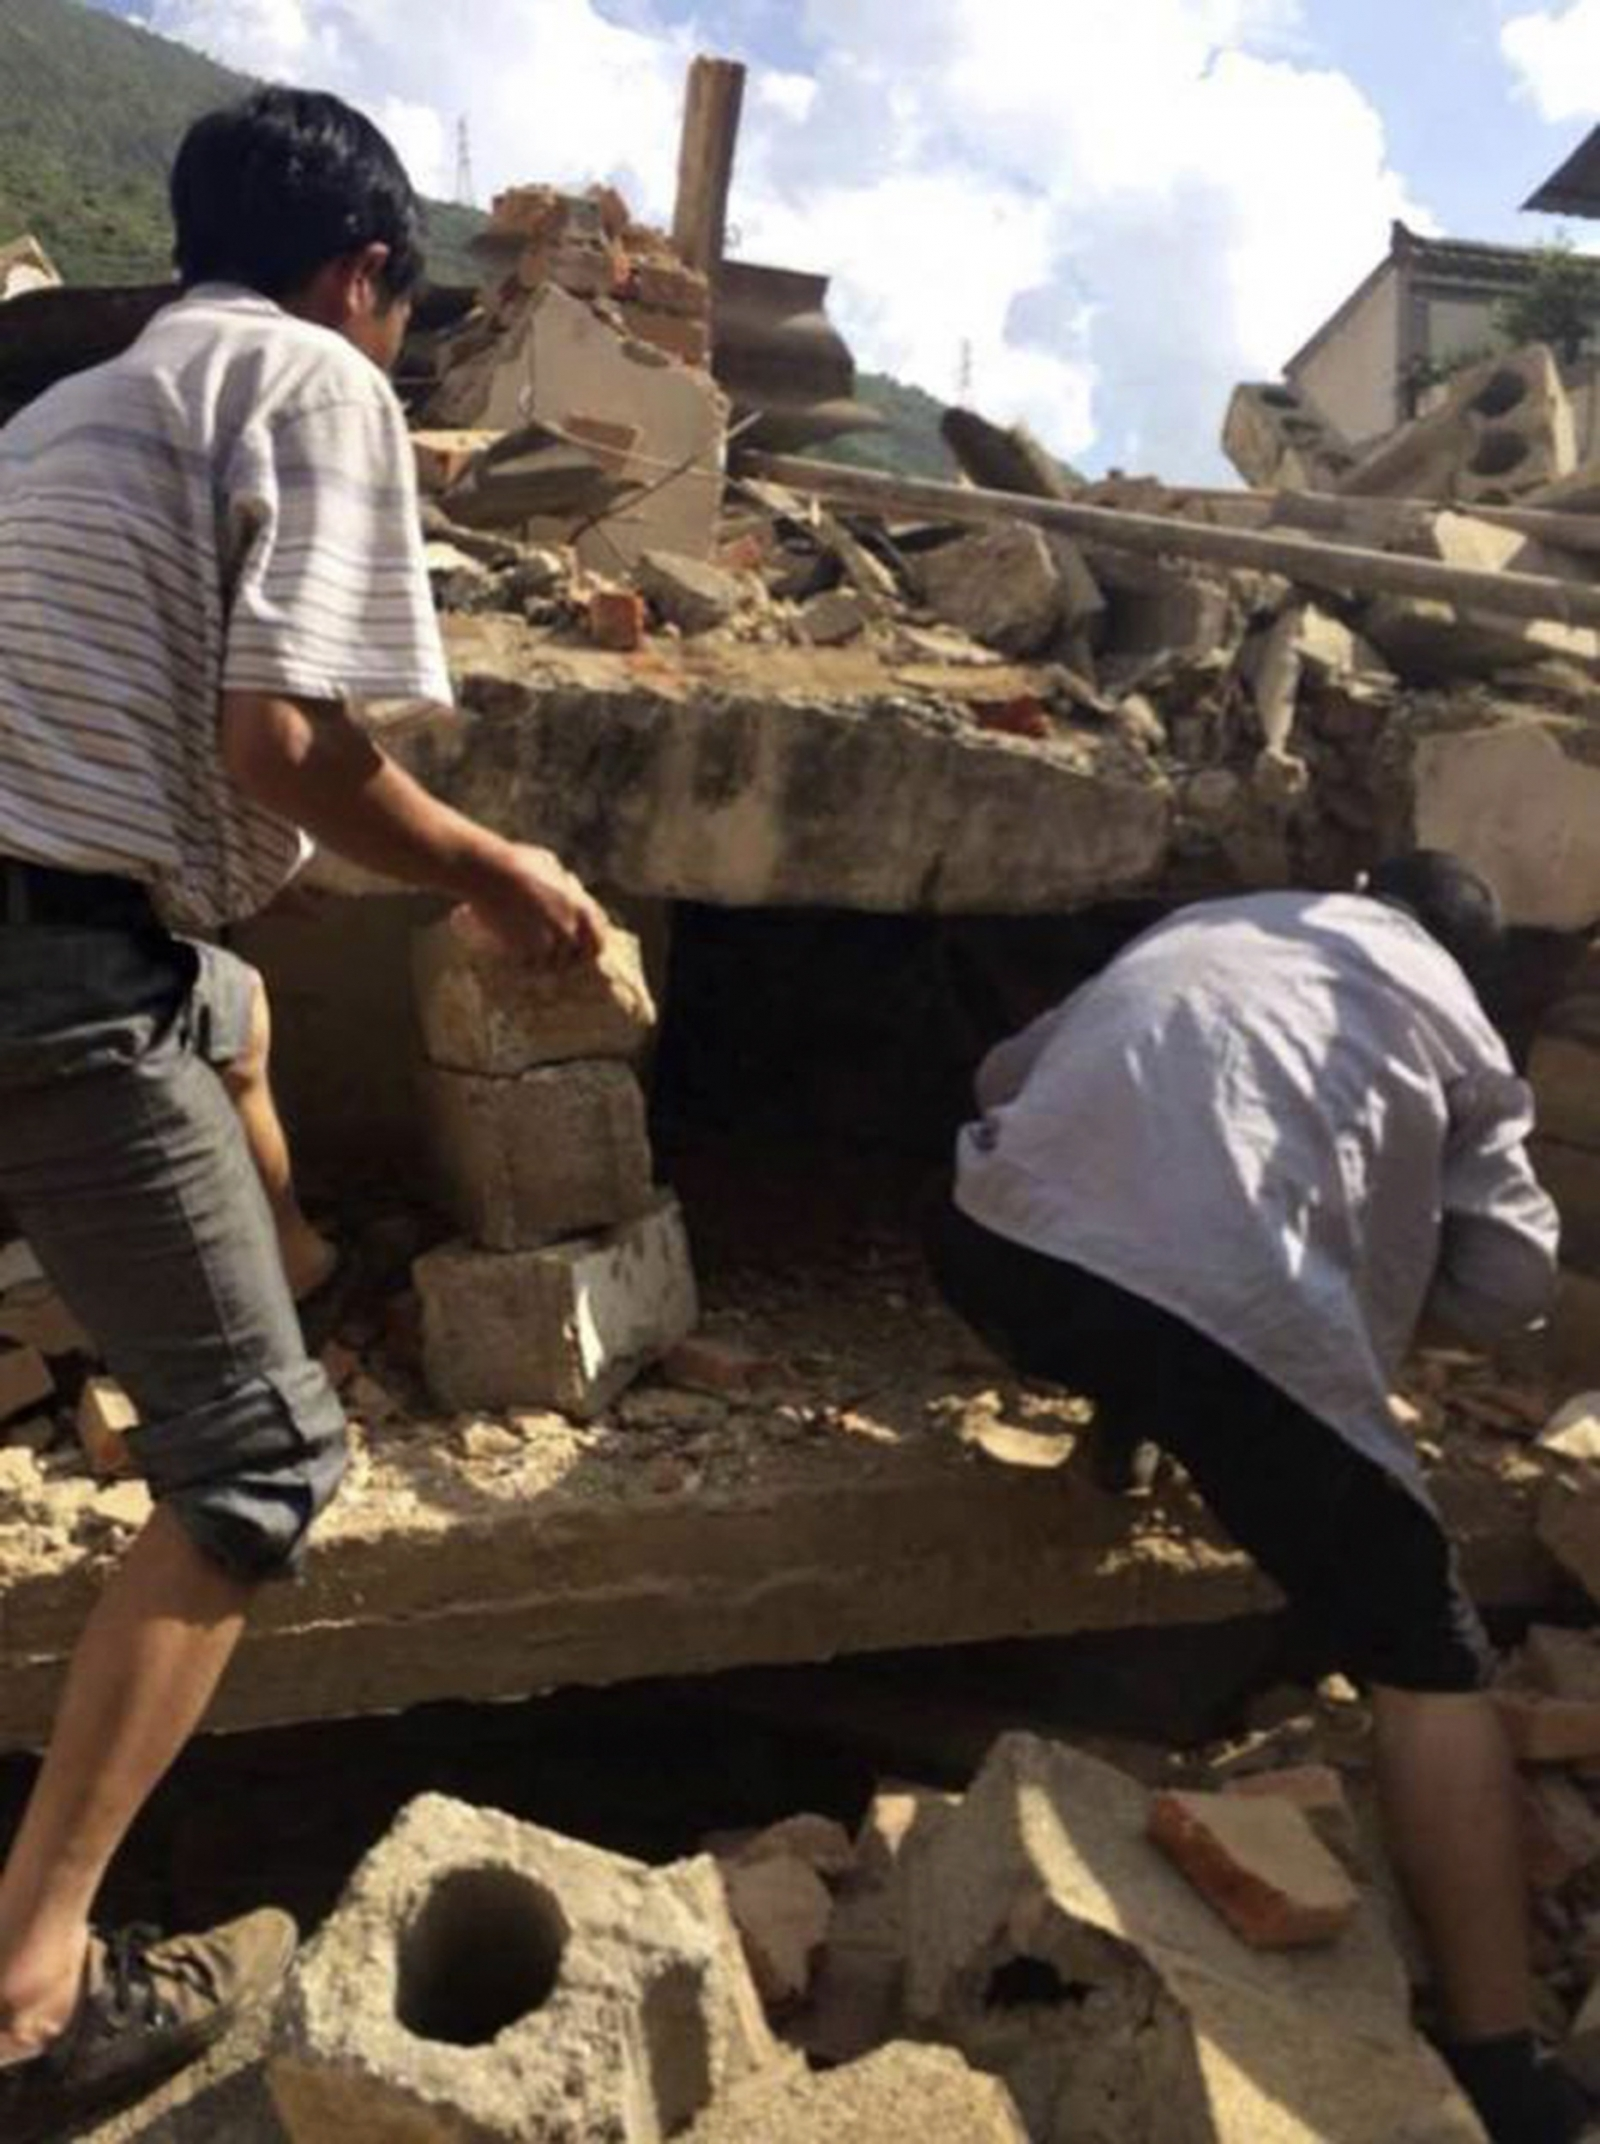 Yunnan Earthquake Search for survivors